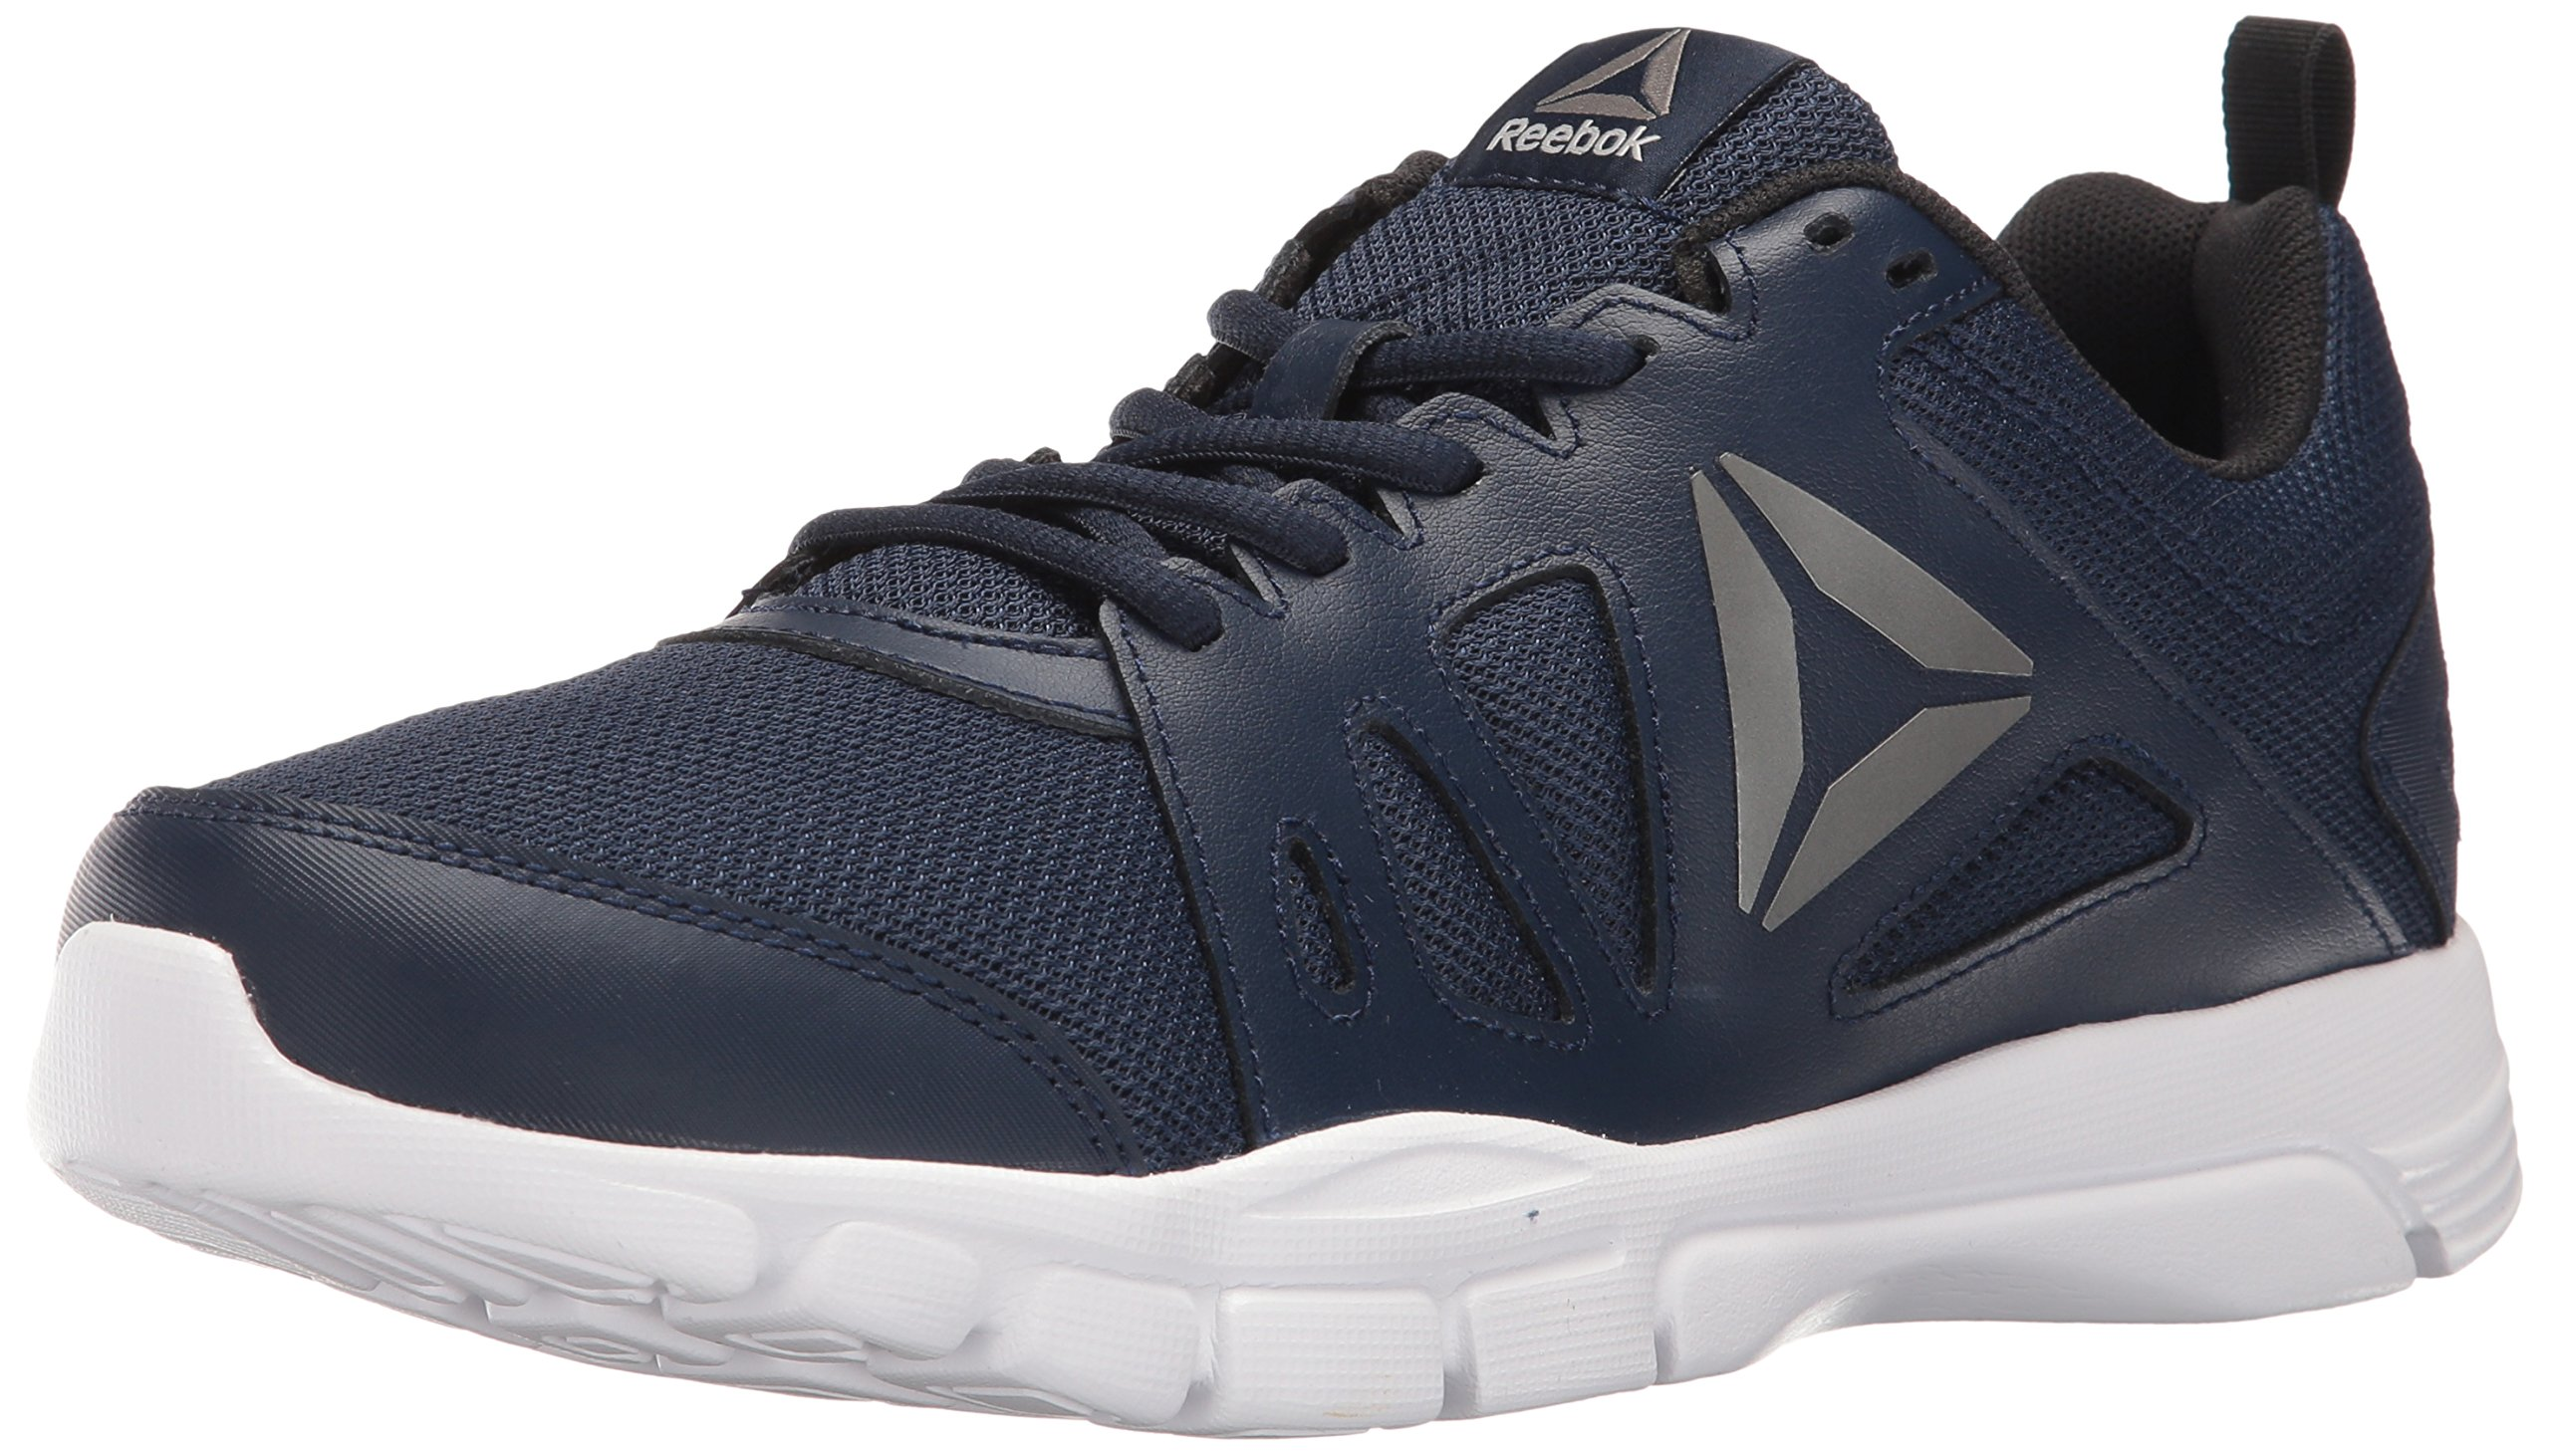 03d65e56df4c67 Galleon - Reebok Men s Trainfusion Nine 2.0 L MT Running Shoe ...